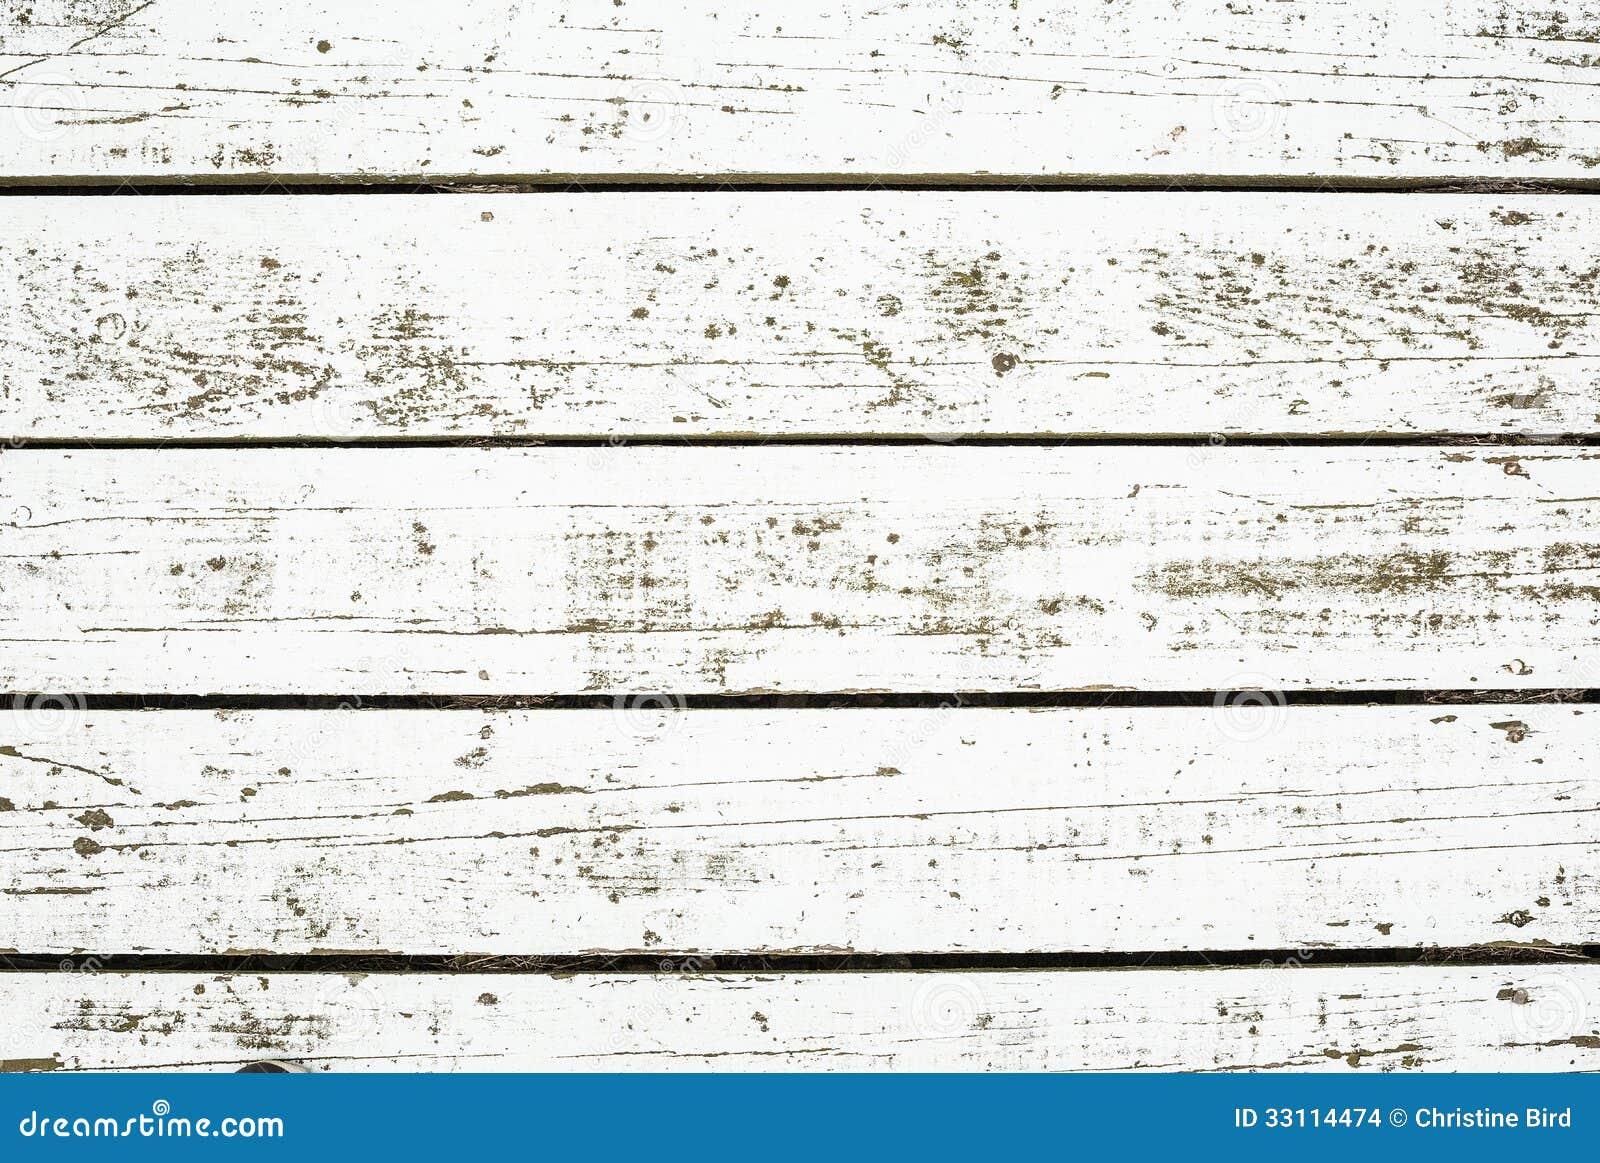 royaltyfree stock photo download white washed wood